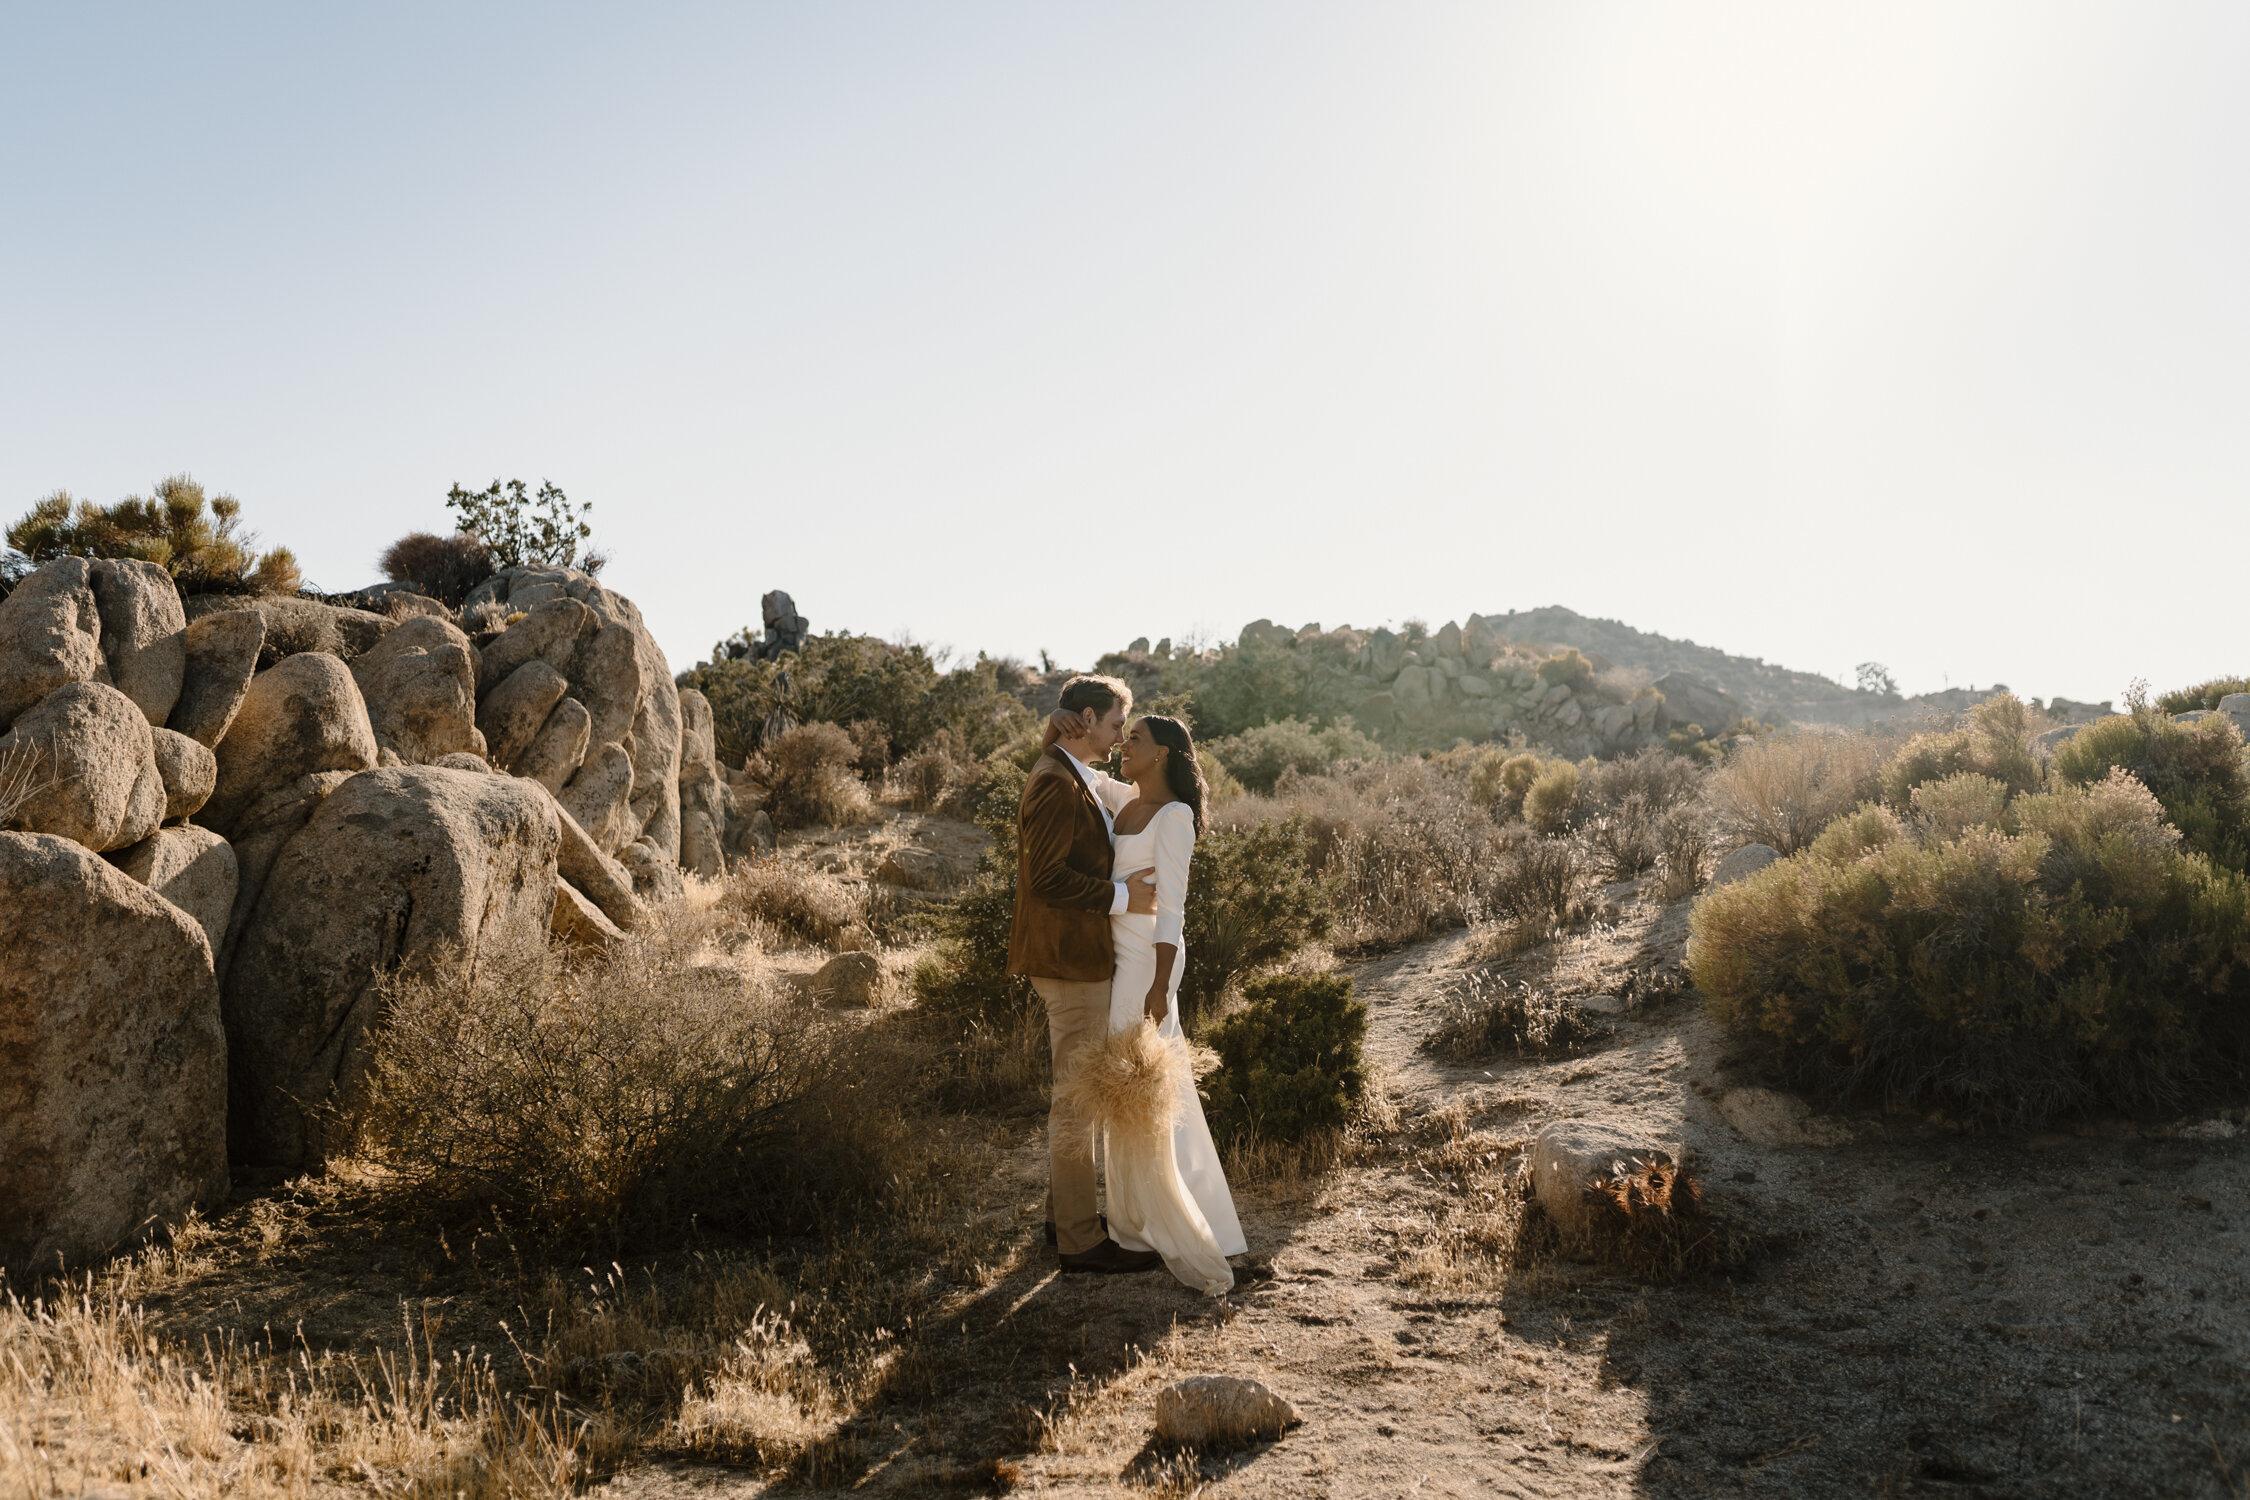 Adventurous Joshua Tree, California Elopement | Kayli LaFon Photography